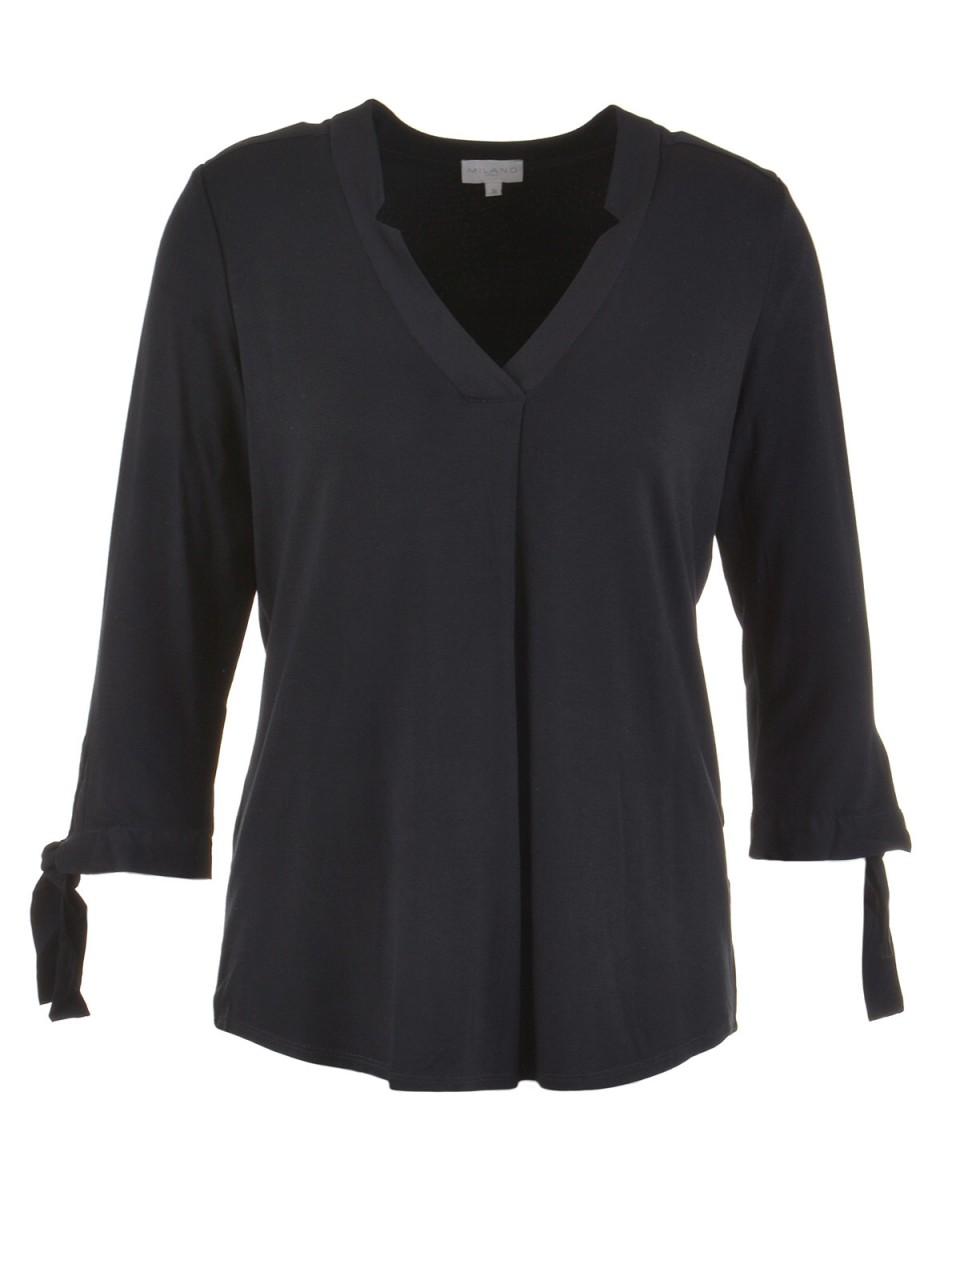 milano-italy-damen-bluse-schwarz, 59.95 EUR @ designermode-com-mode